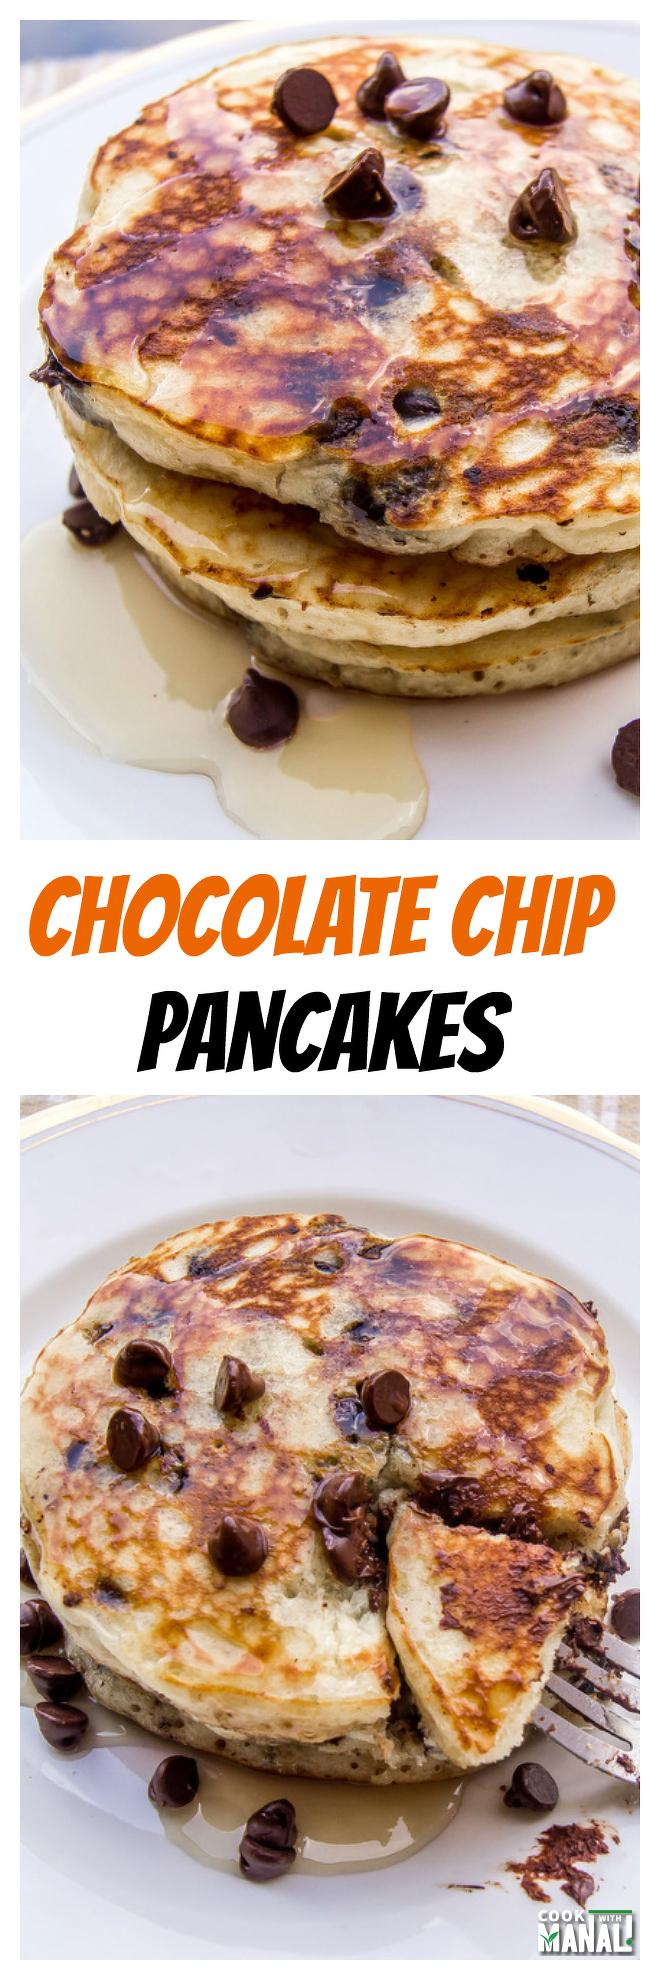 chocolate chip pancakes collage